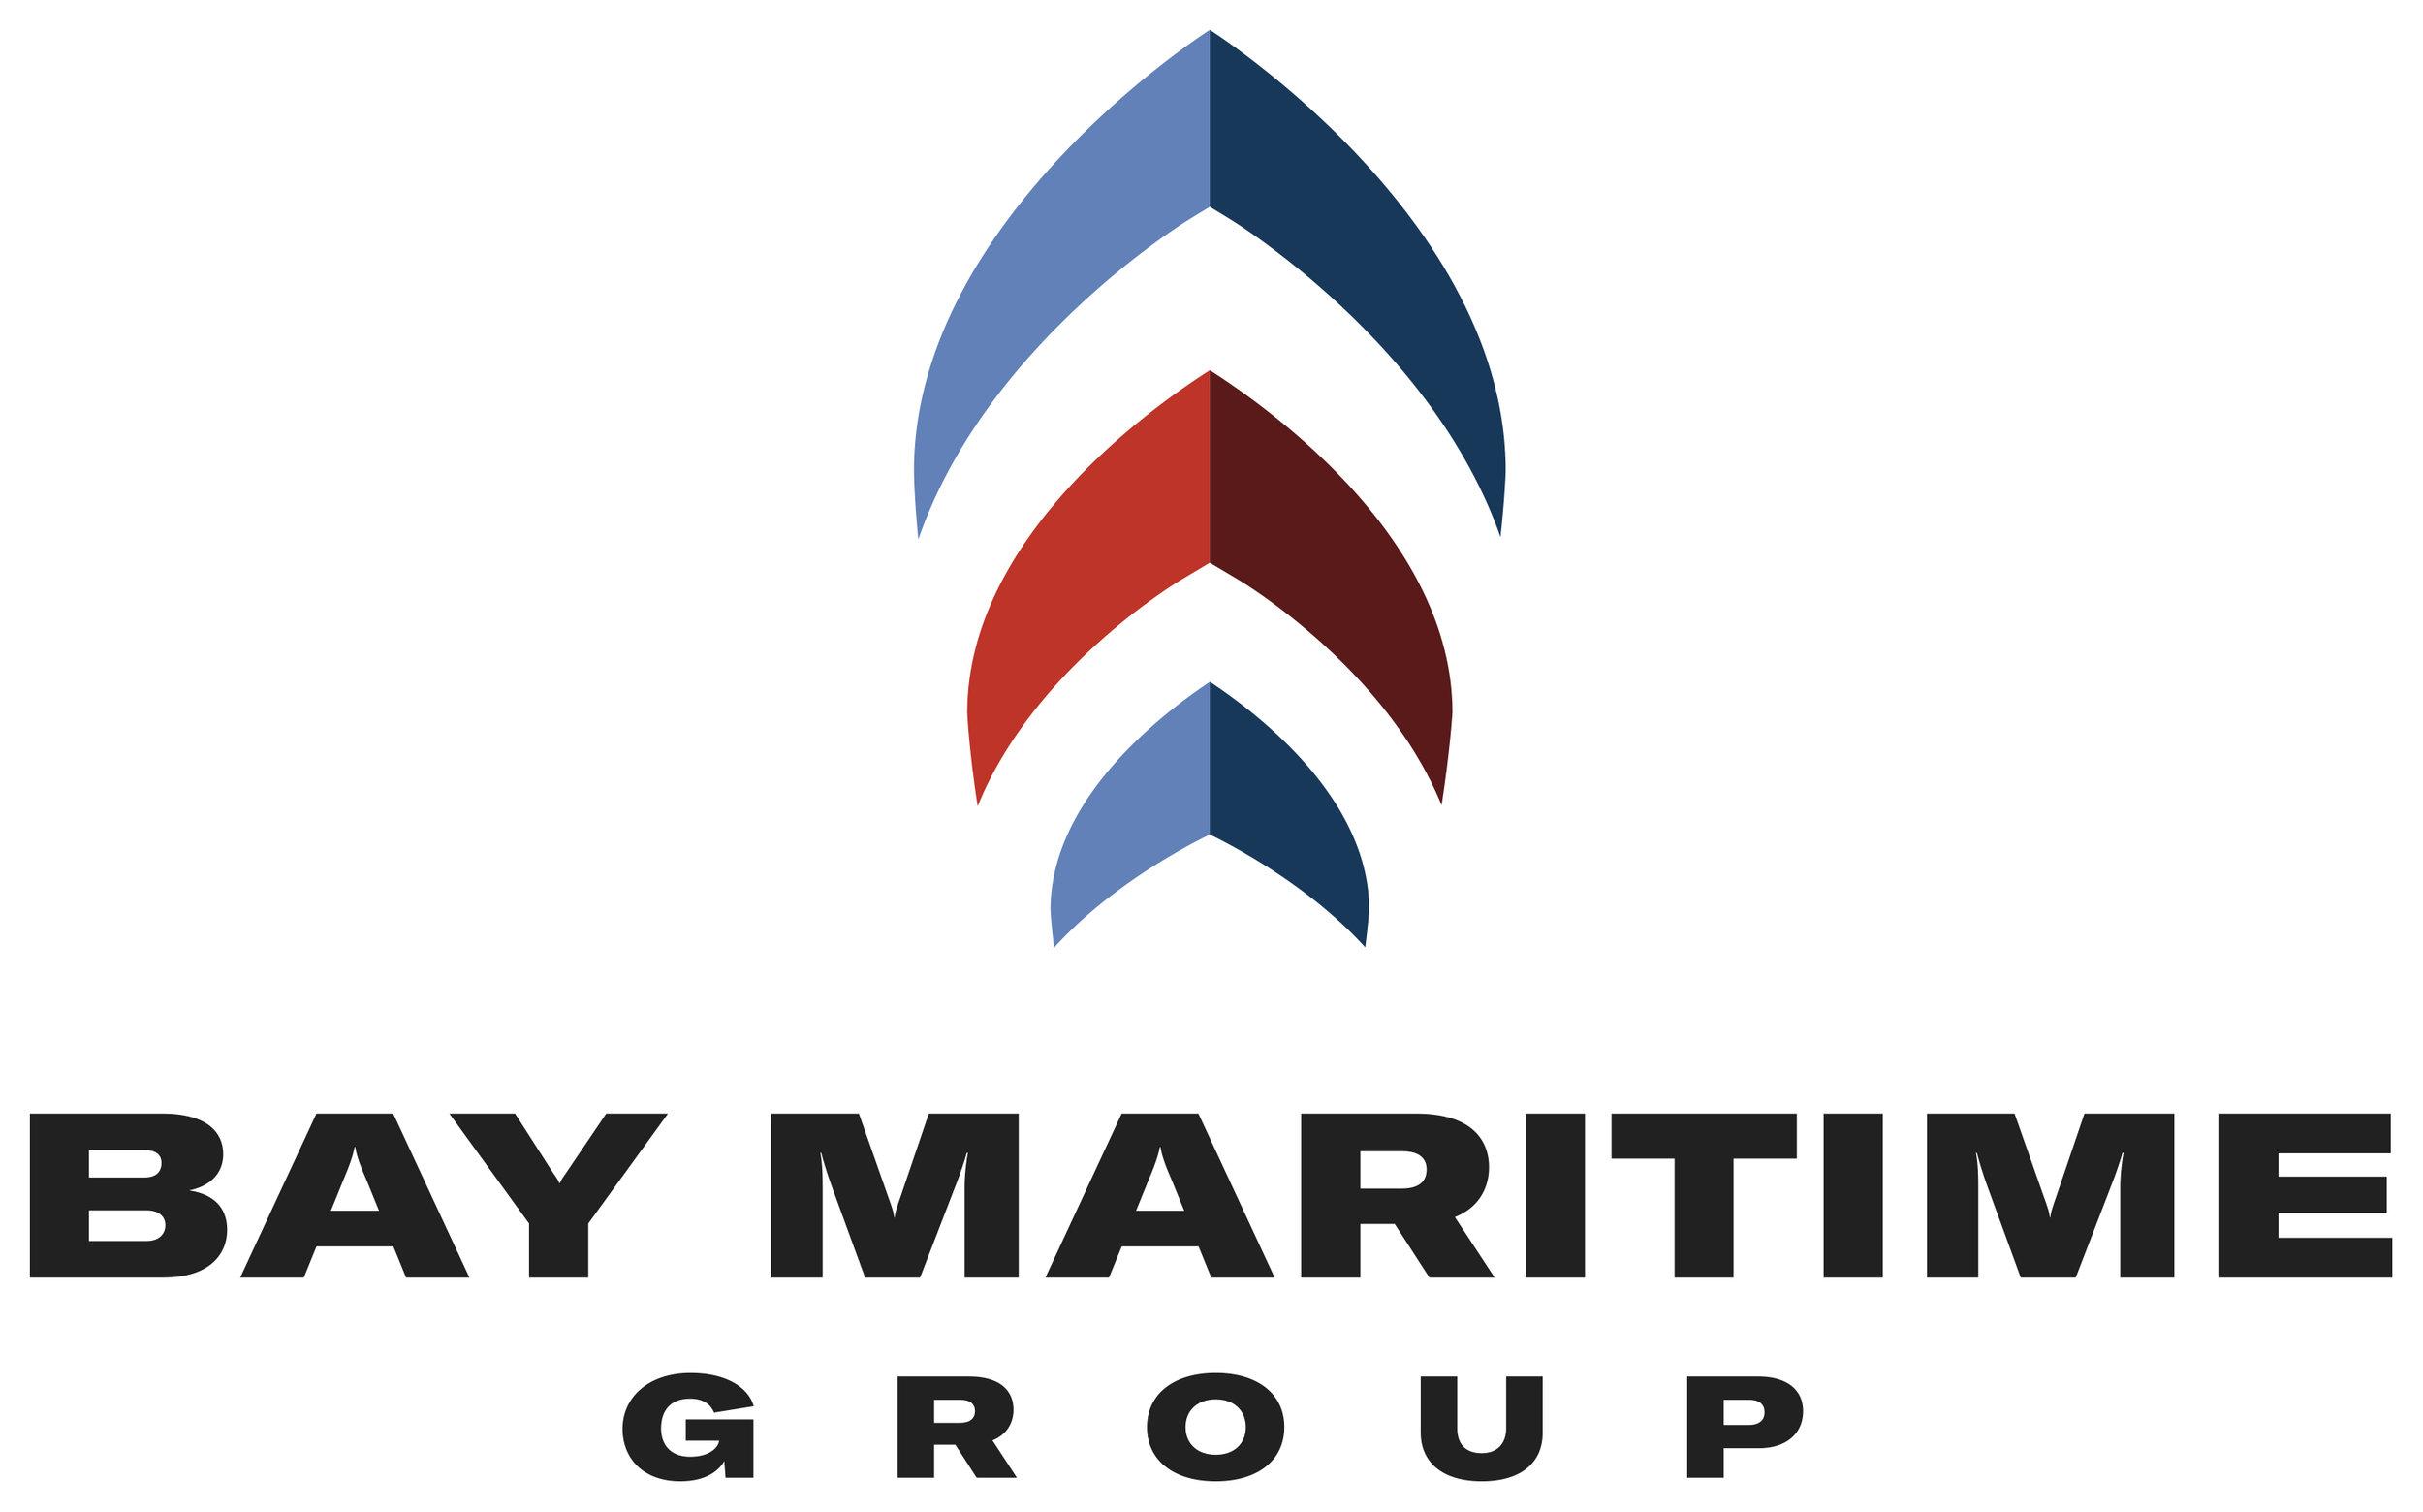 BMN0001_BayMaritimeGroup_logo_RGB.jpg